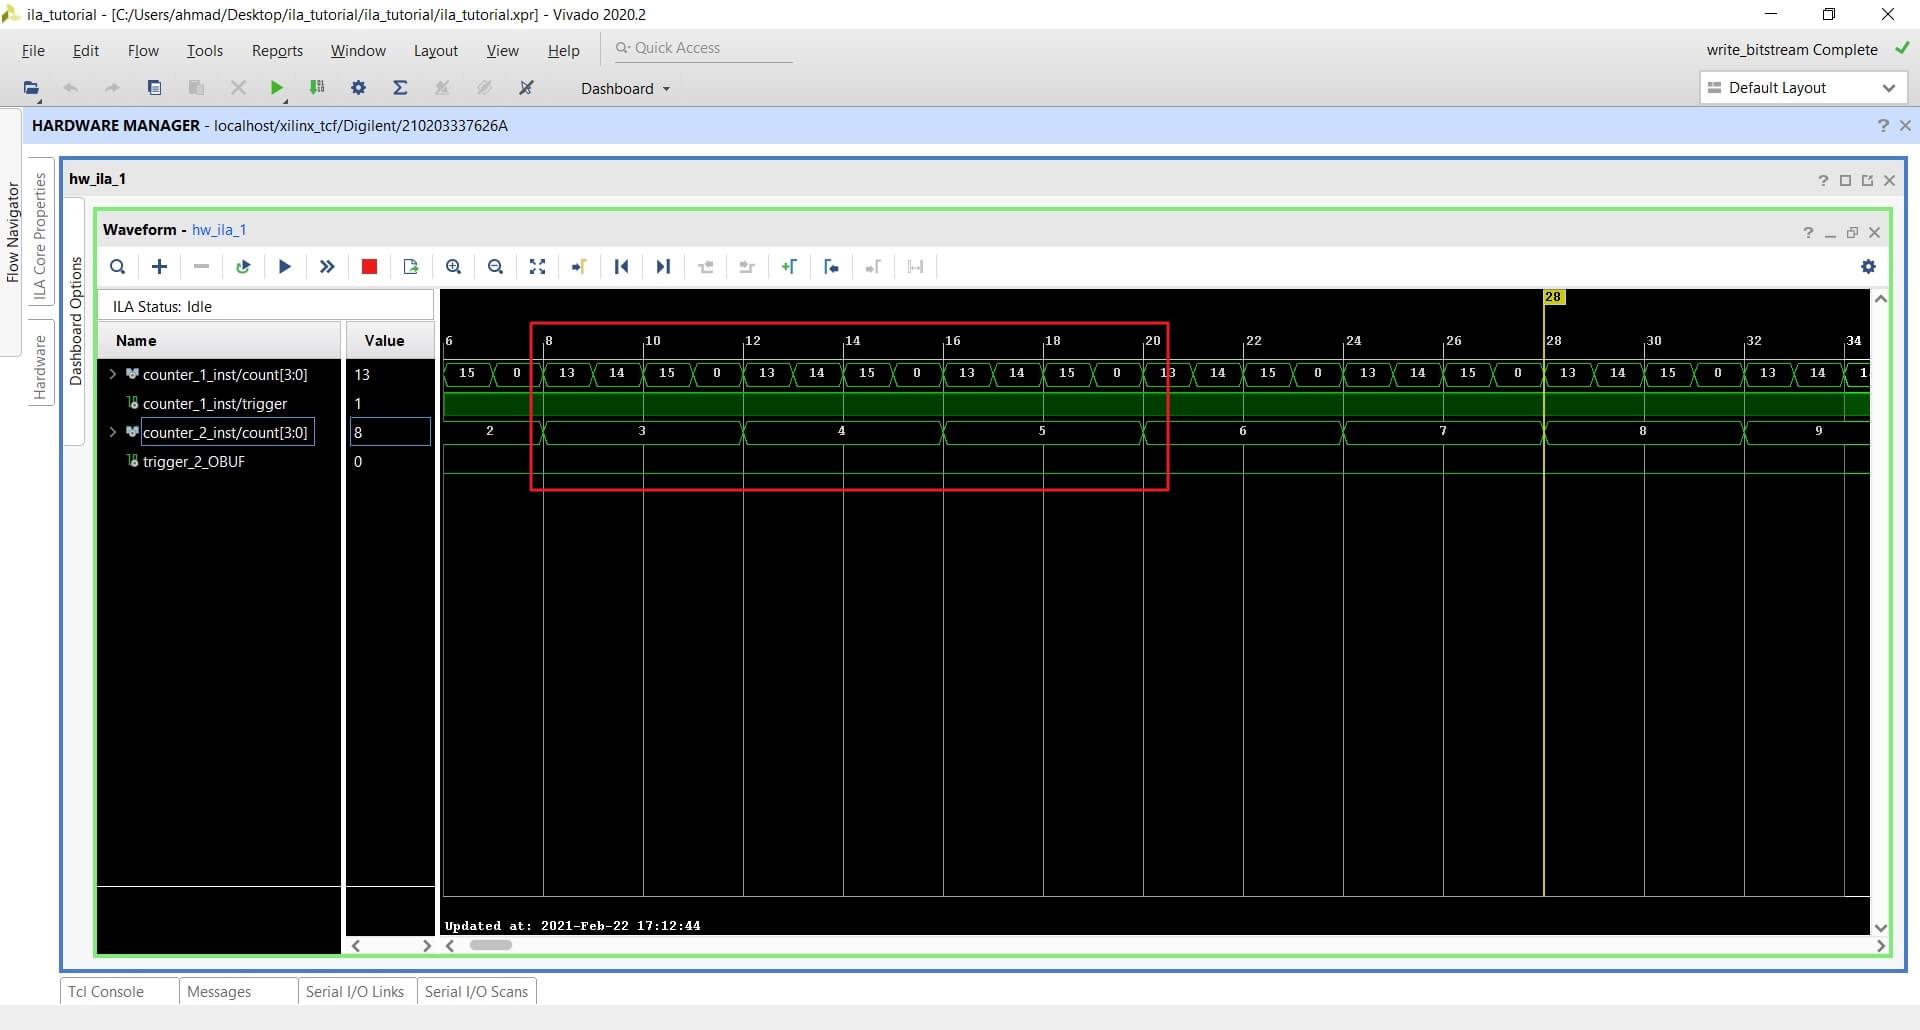 Filtered ILA samples using Capture mode in vivado